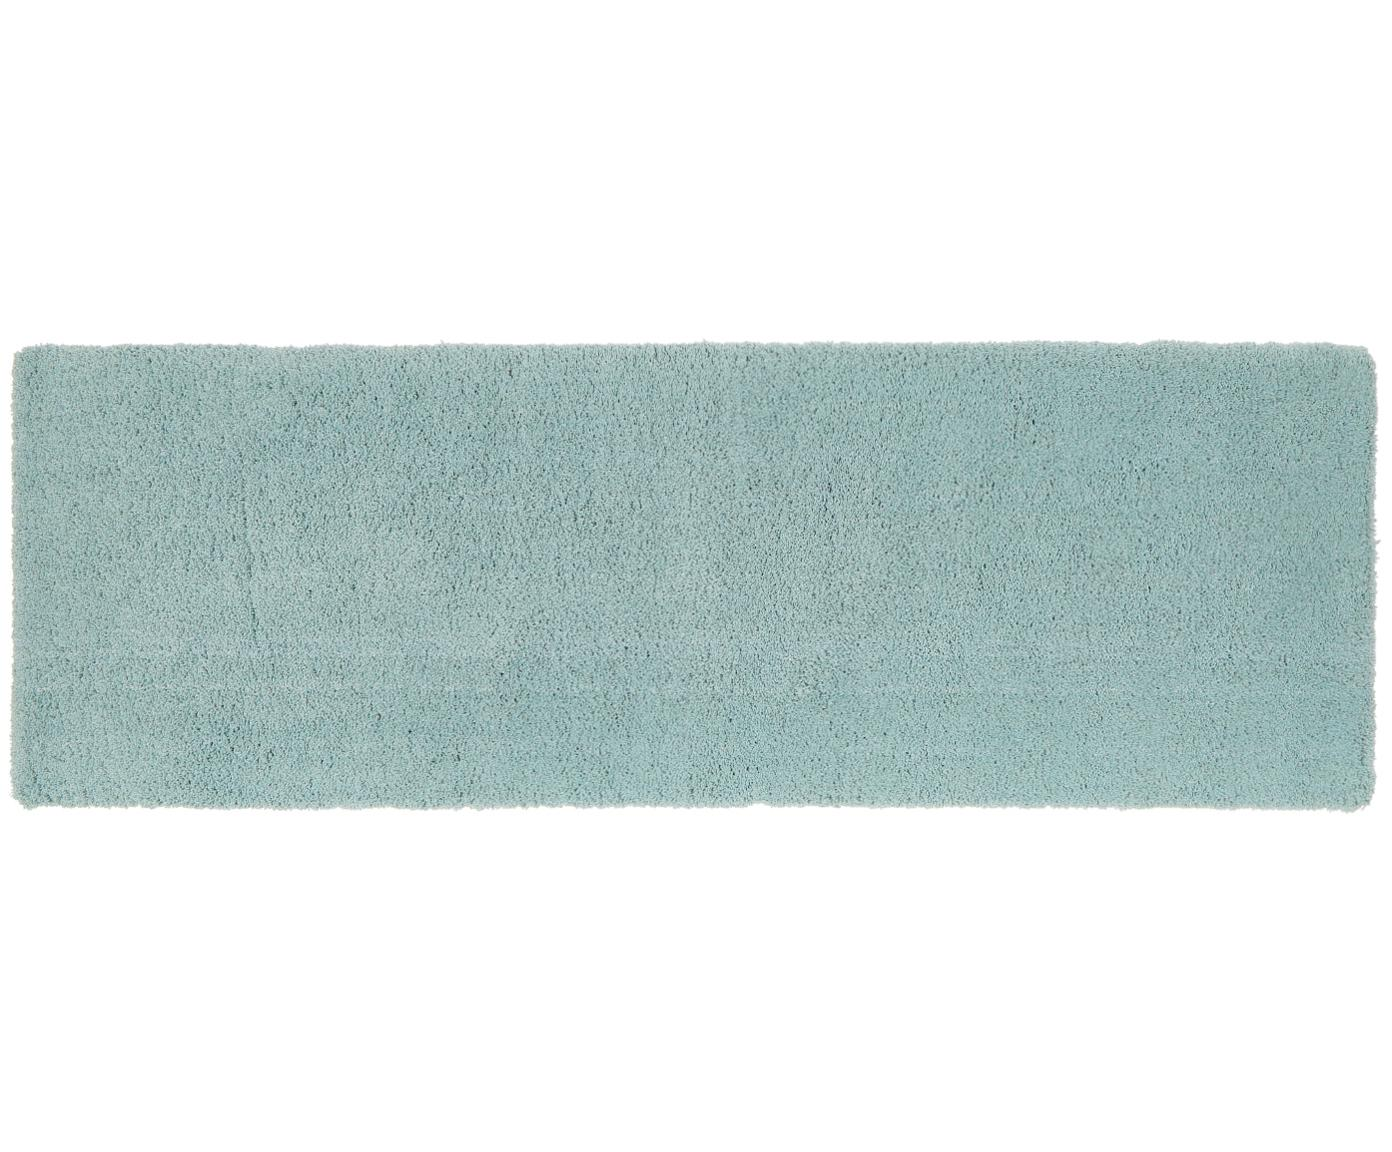 Alfombra de pelo largo Leighton, Parte superior: 100%poliéster (microfibr, Reverso: 100%poliéster, Verde menta, An 80 x L 250 cm